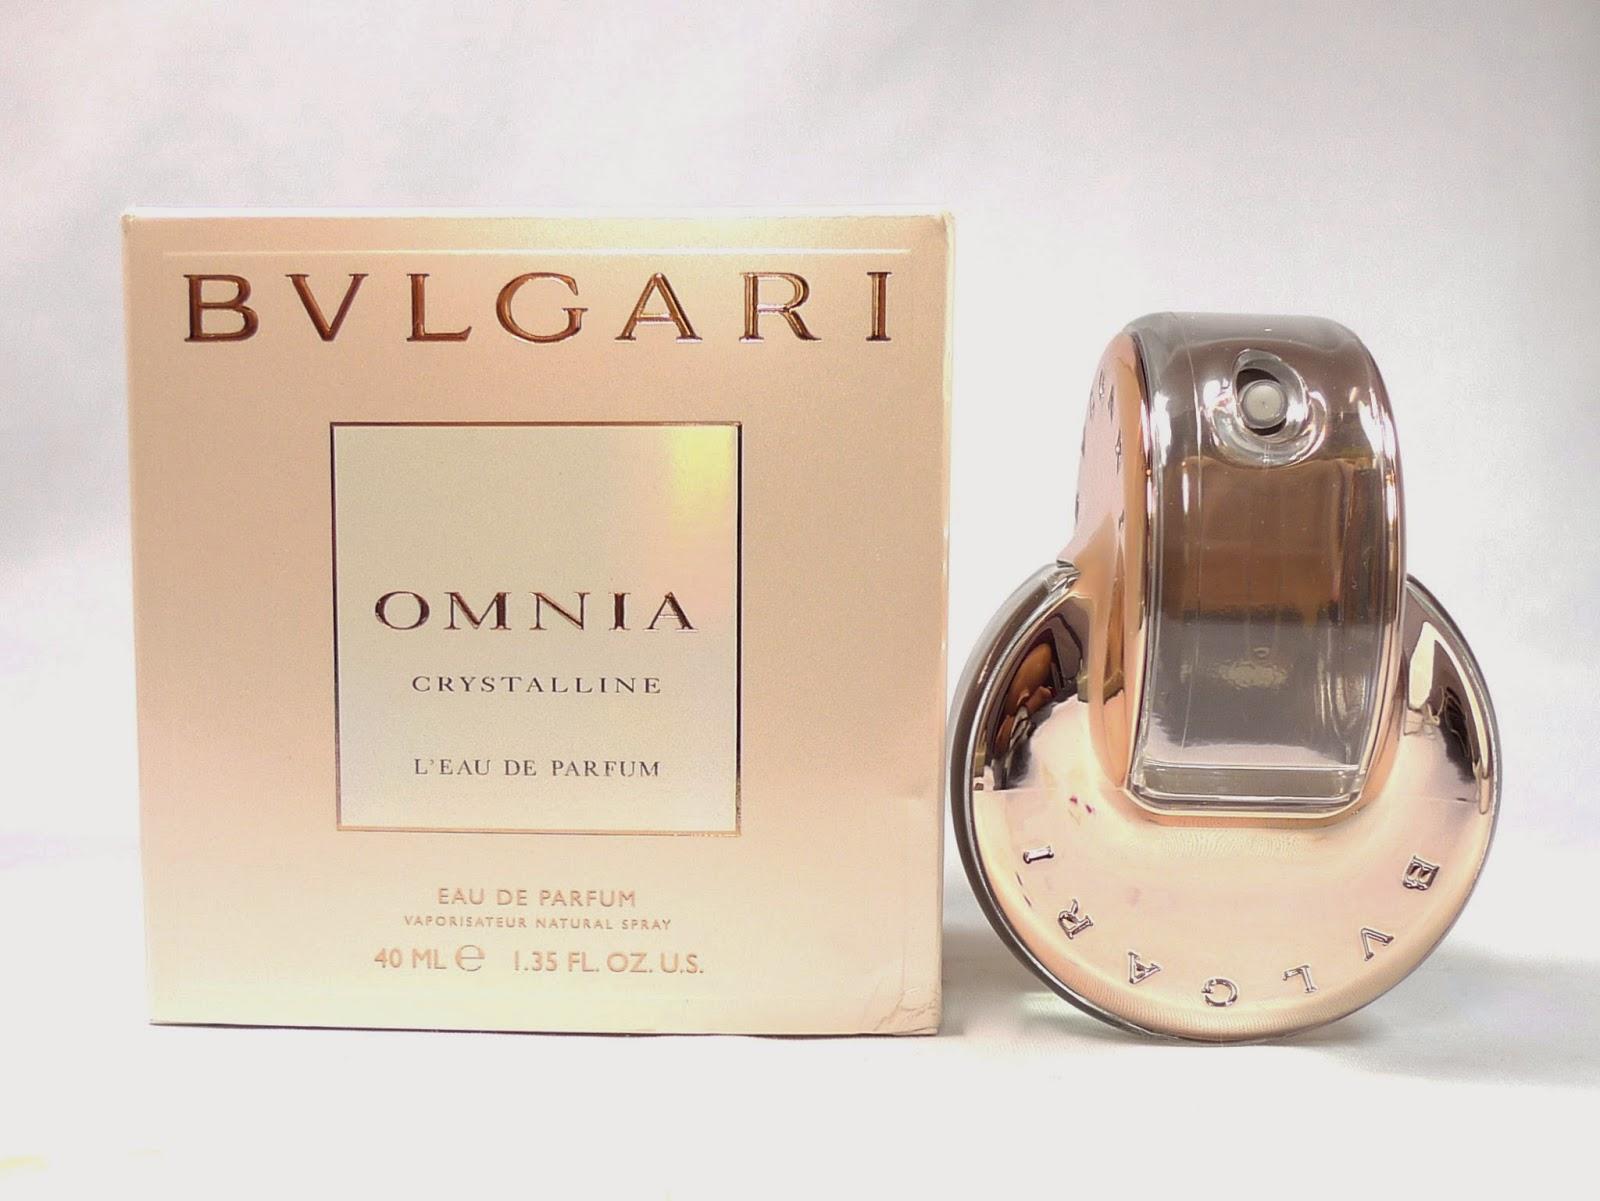 Bvlgari Omnia Crystalline Leau De Parfum Review The Beauty Junkee